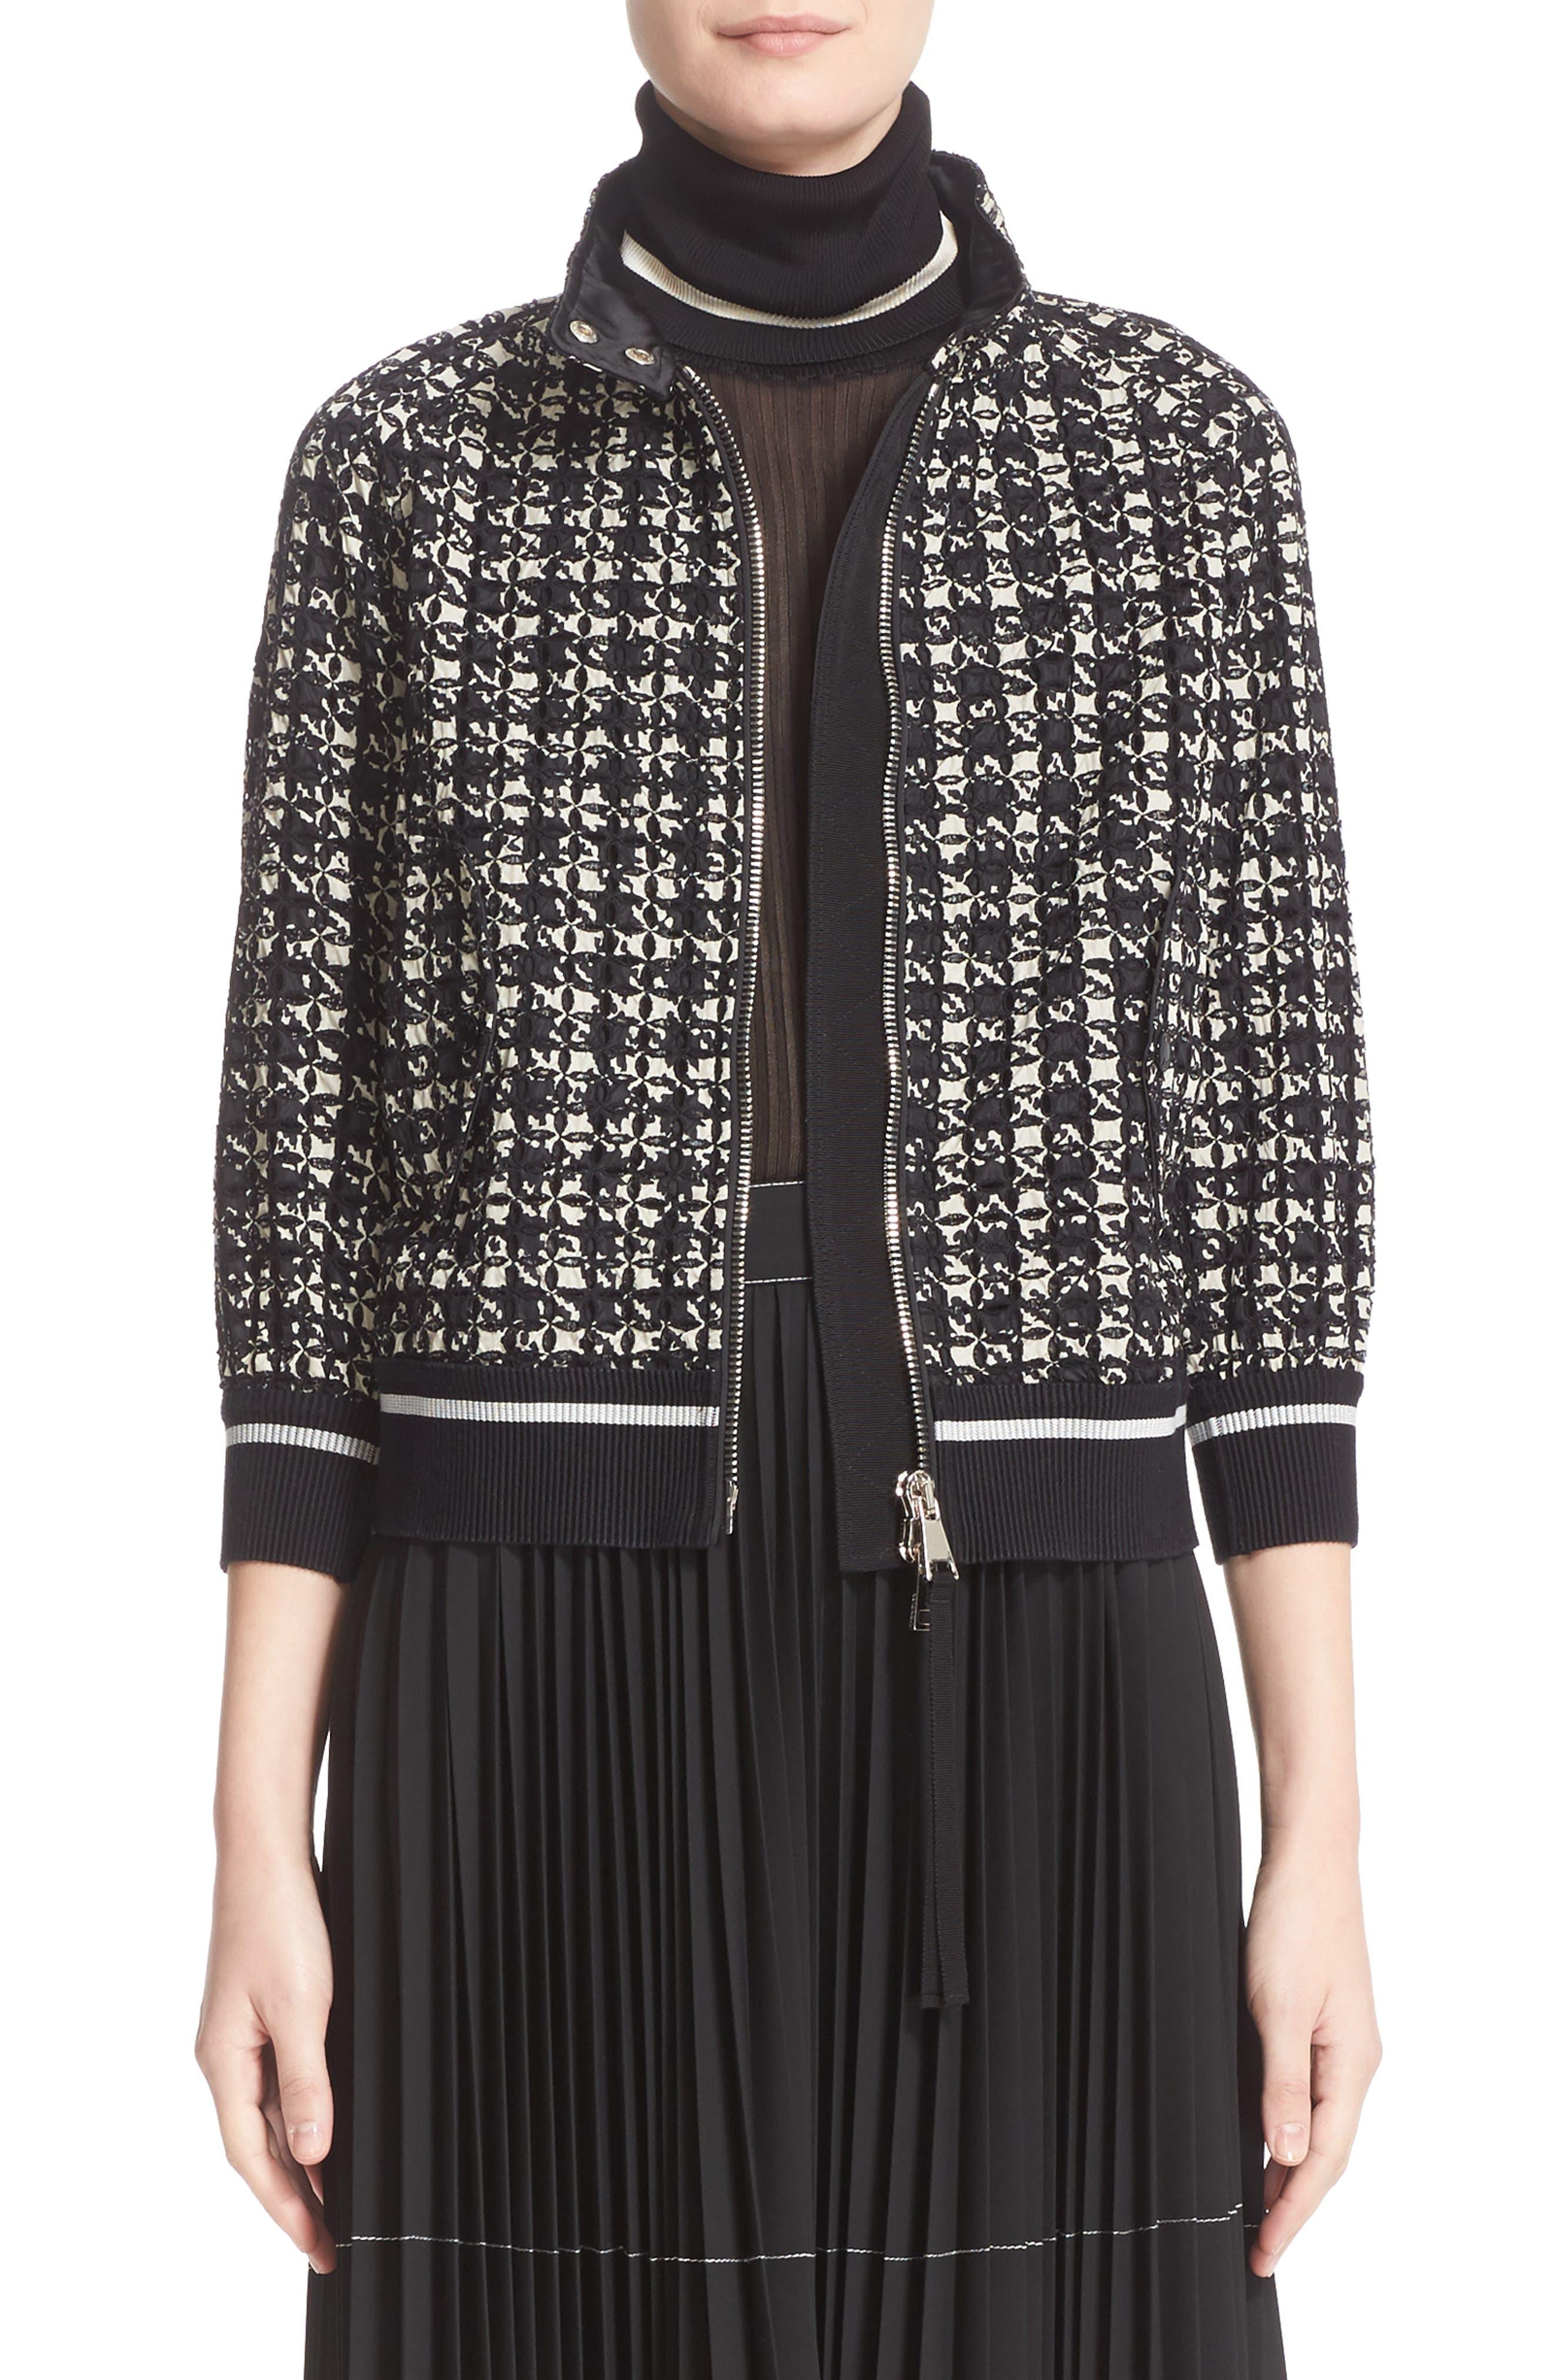 Main Image - Moncler Fiadone Tweed Print Jacket